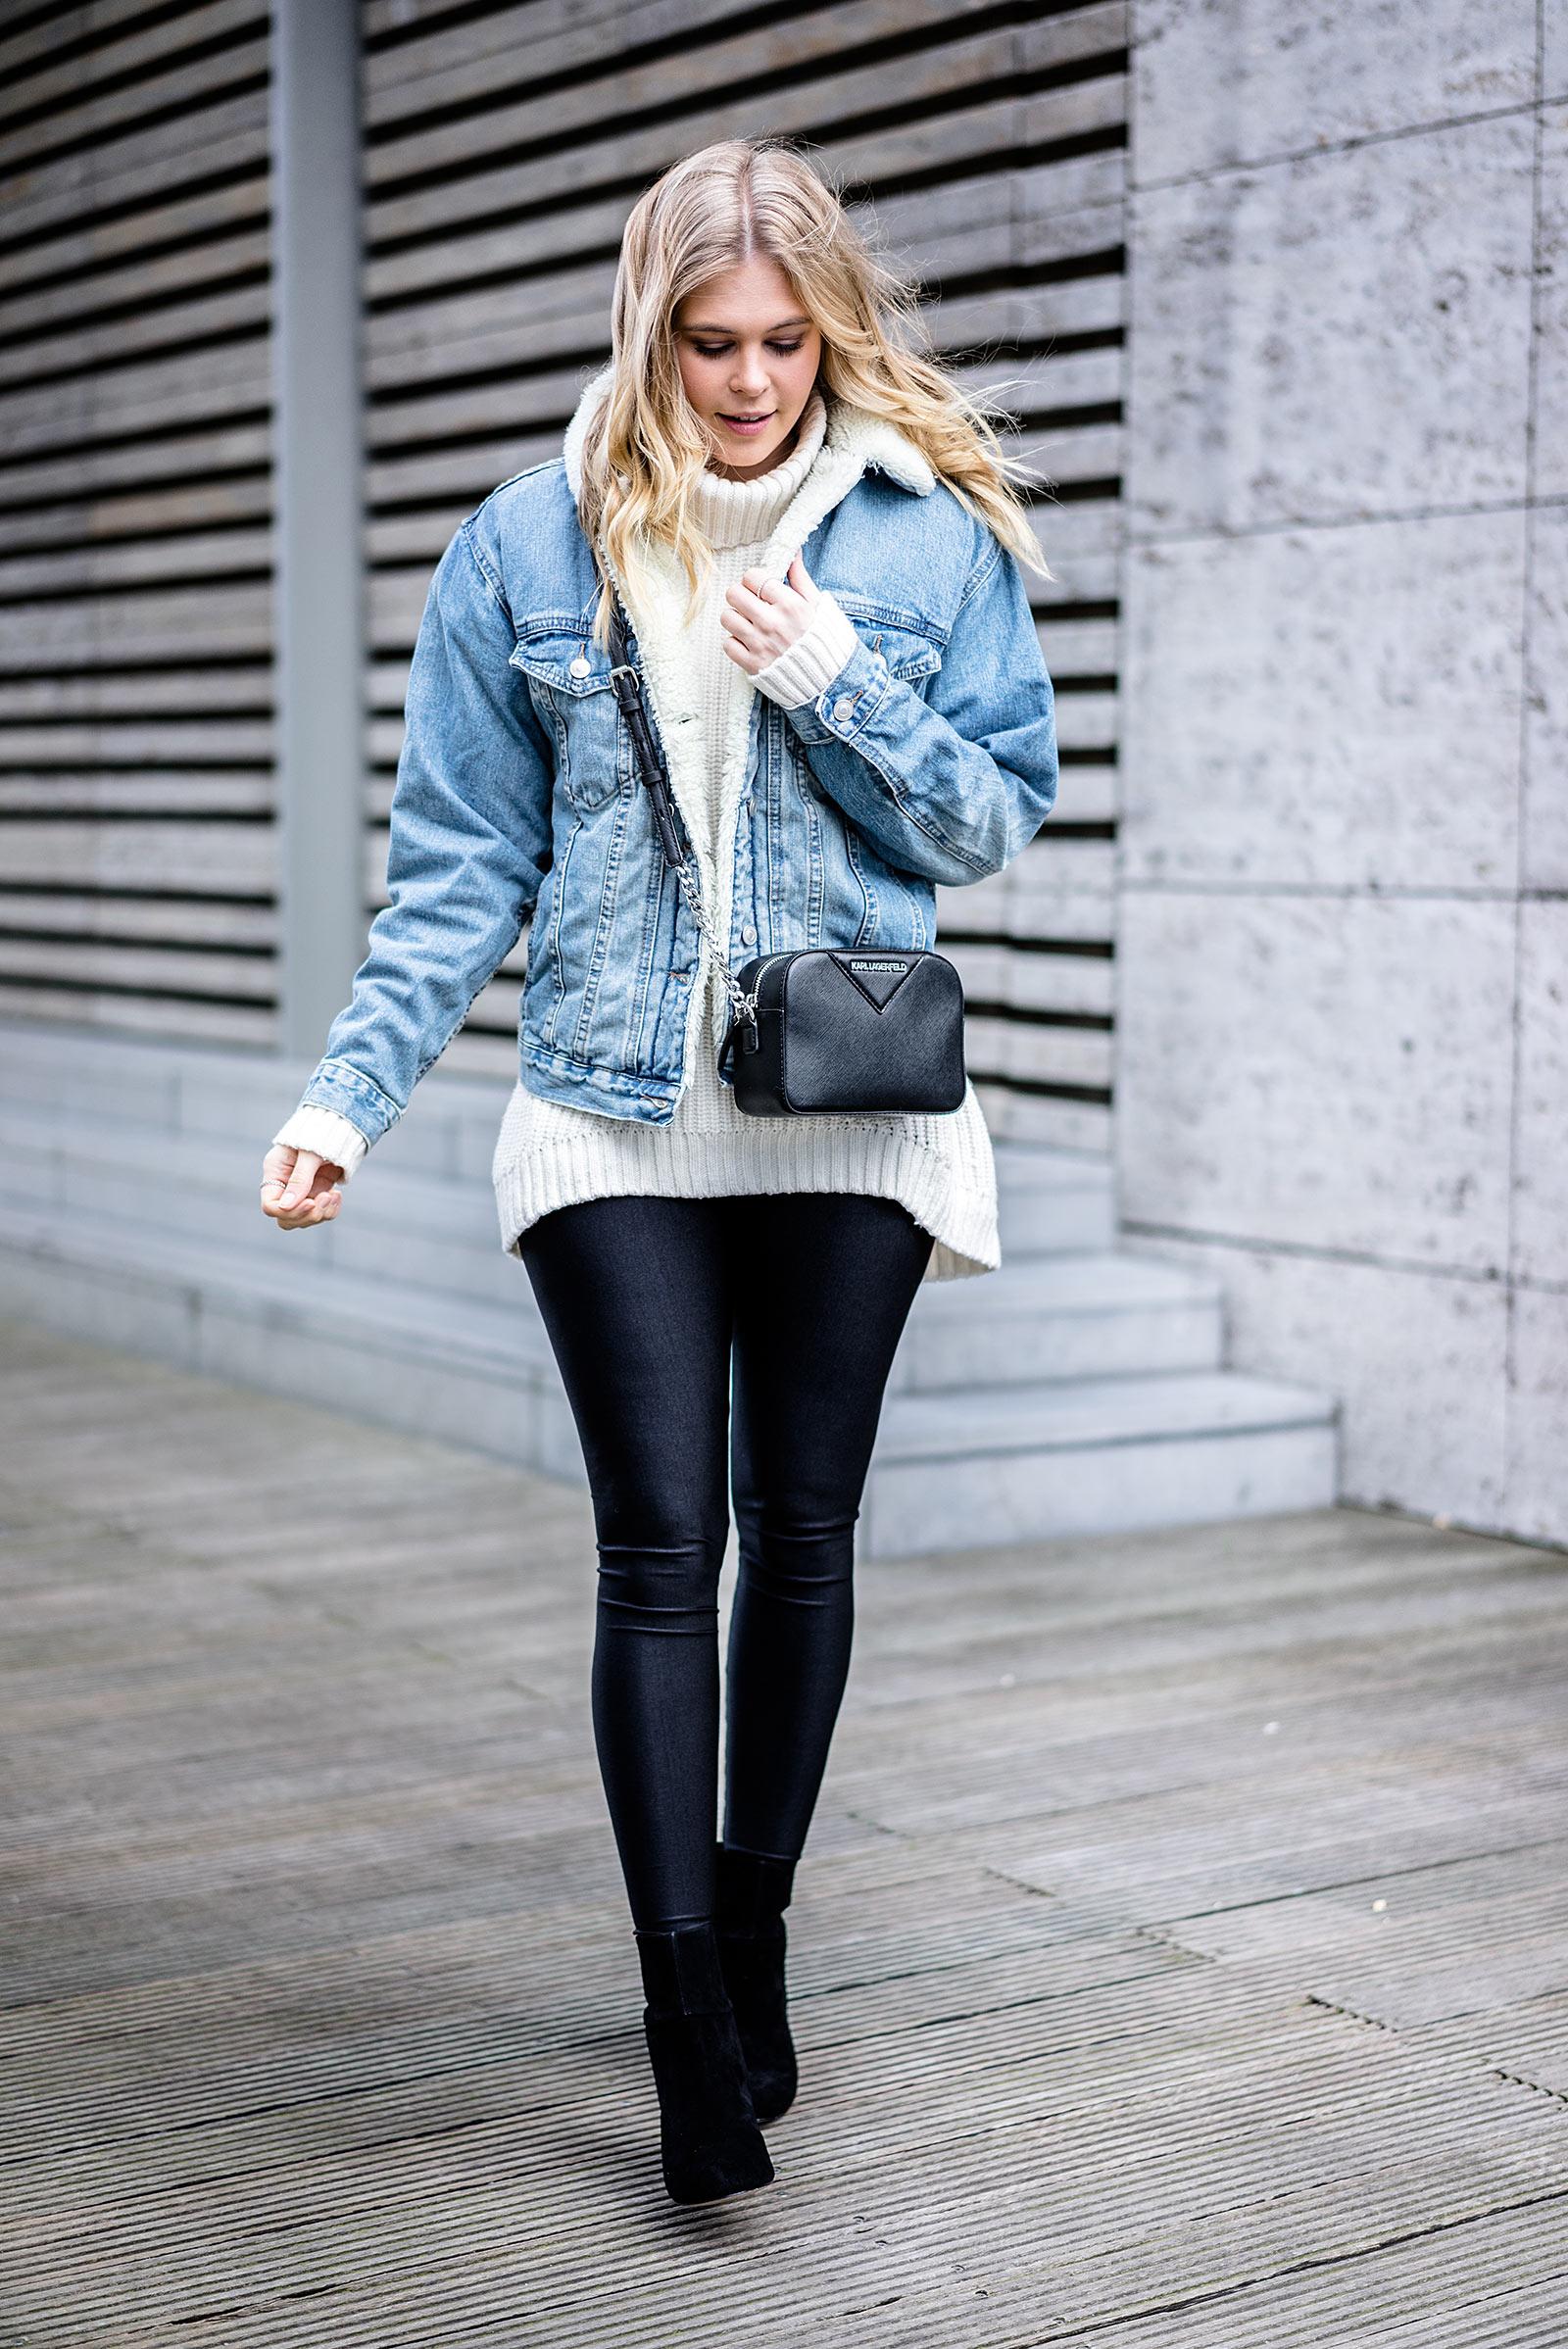 Jeansjacke mit Fell Outfit Fashion Blogger ootd Streetstyle Sunnyinga Düsseldorf